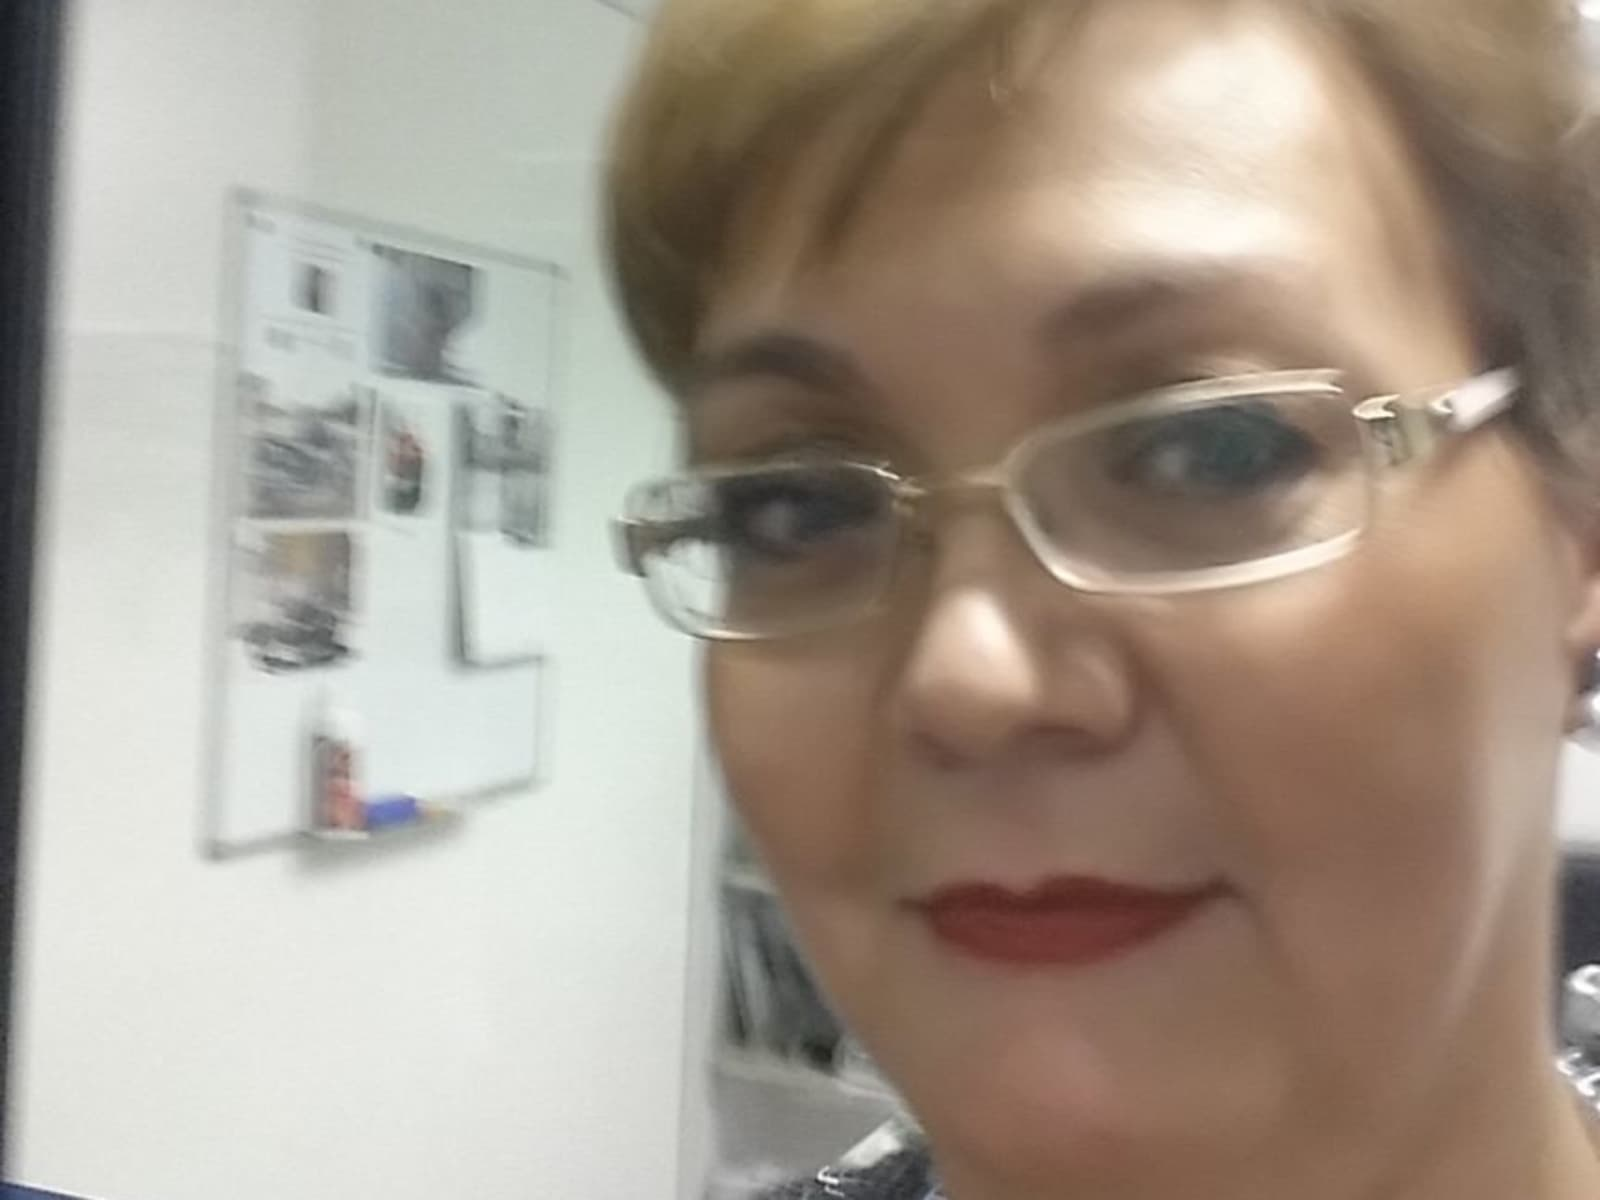 Liane from Brisbane, Queensland, Australia